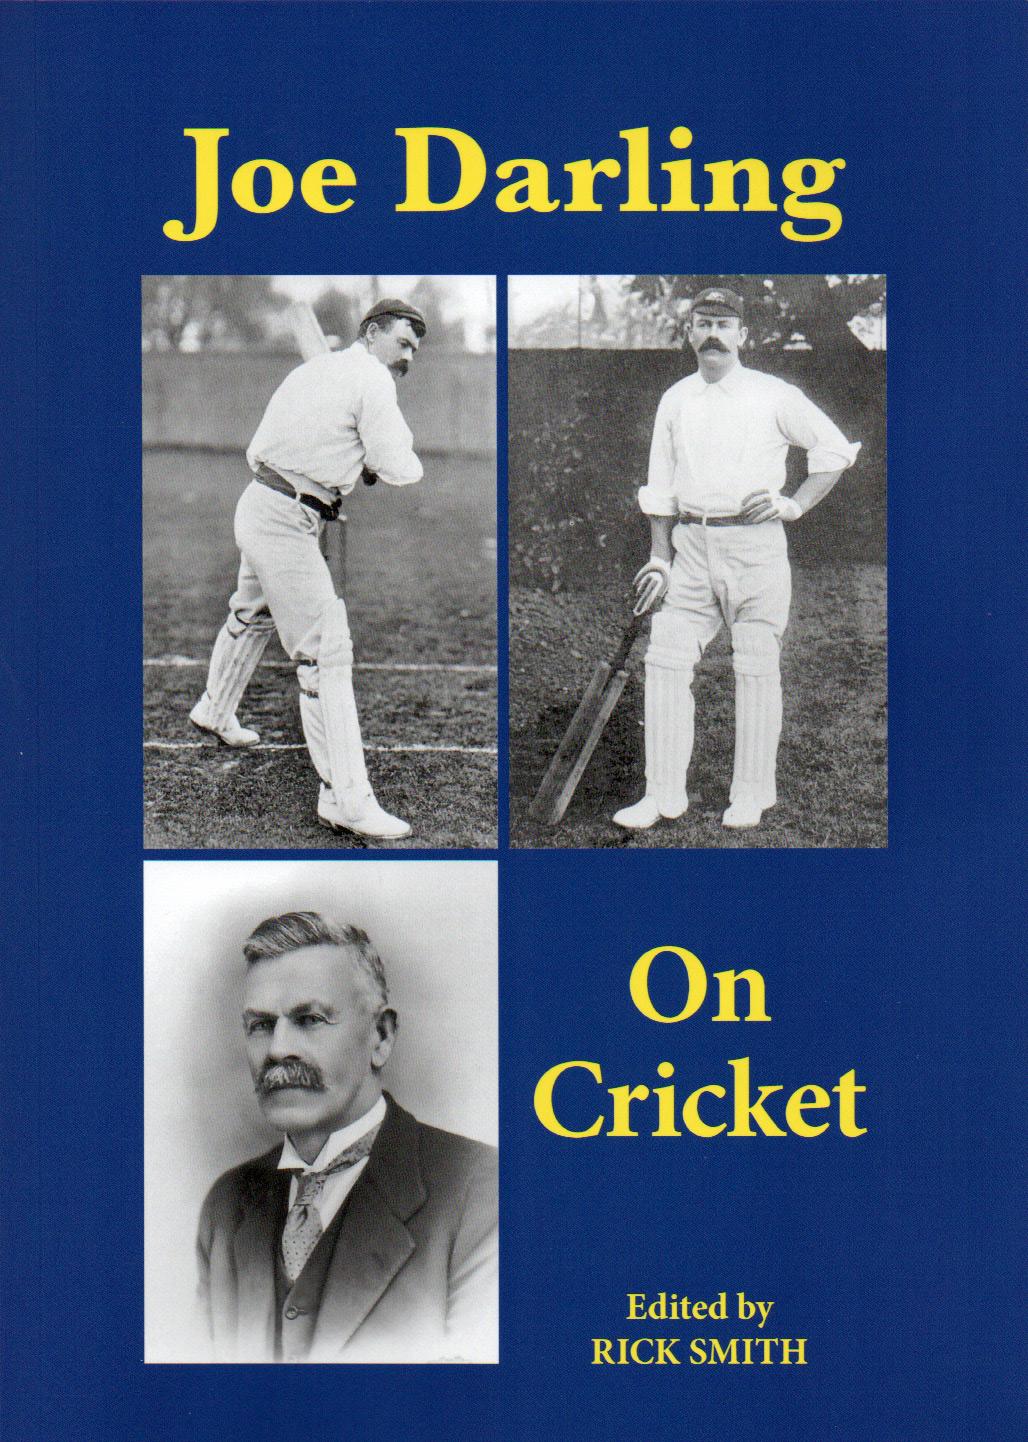 Joe Darling on Cricket